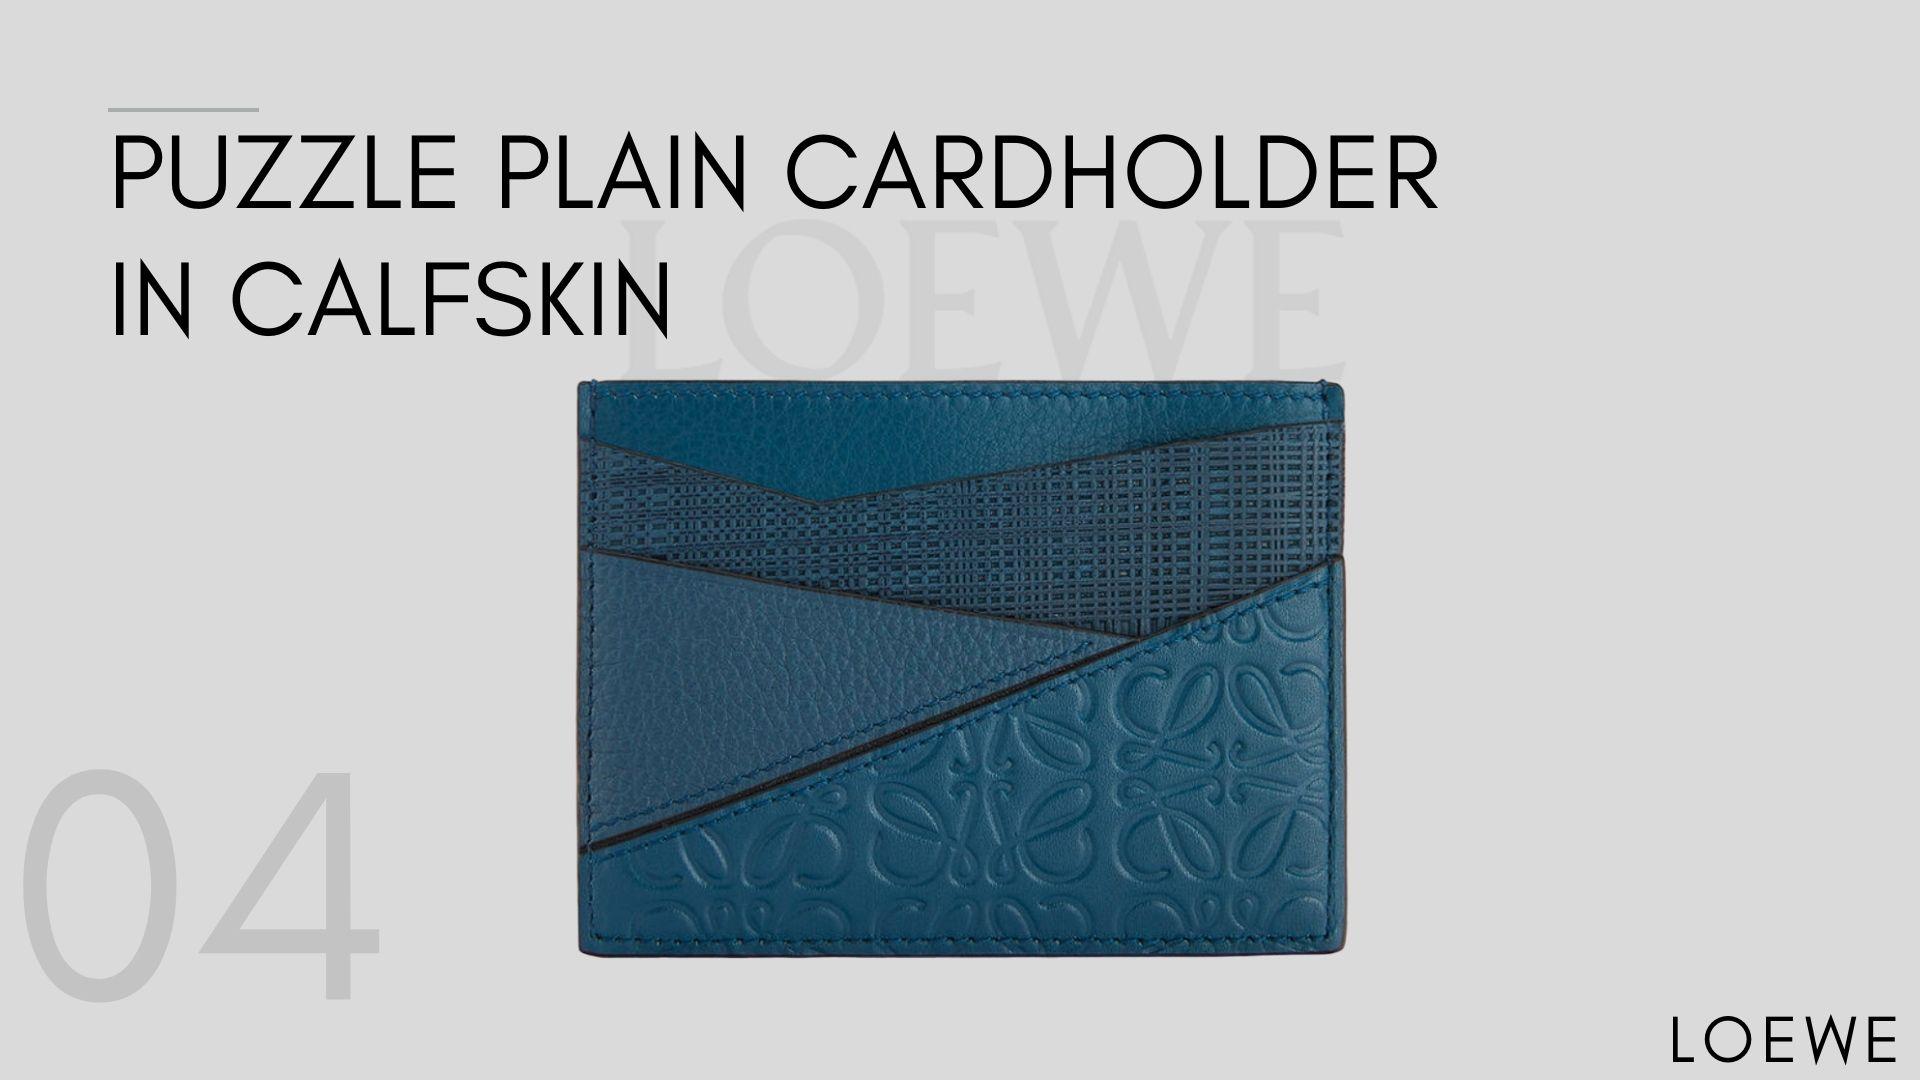 Puzzle Plain Cardholder In Calfskin